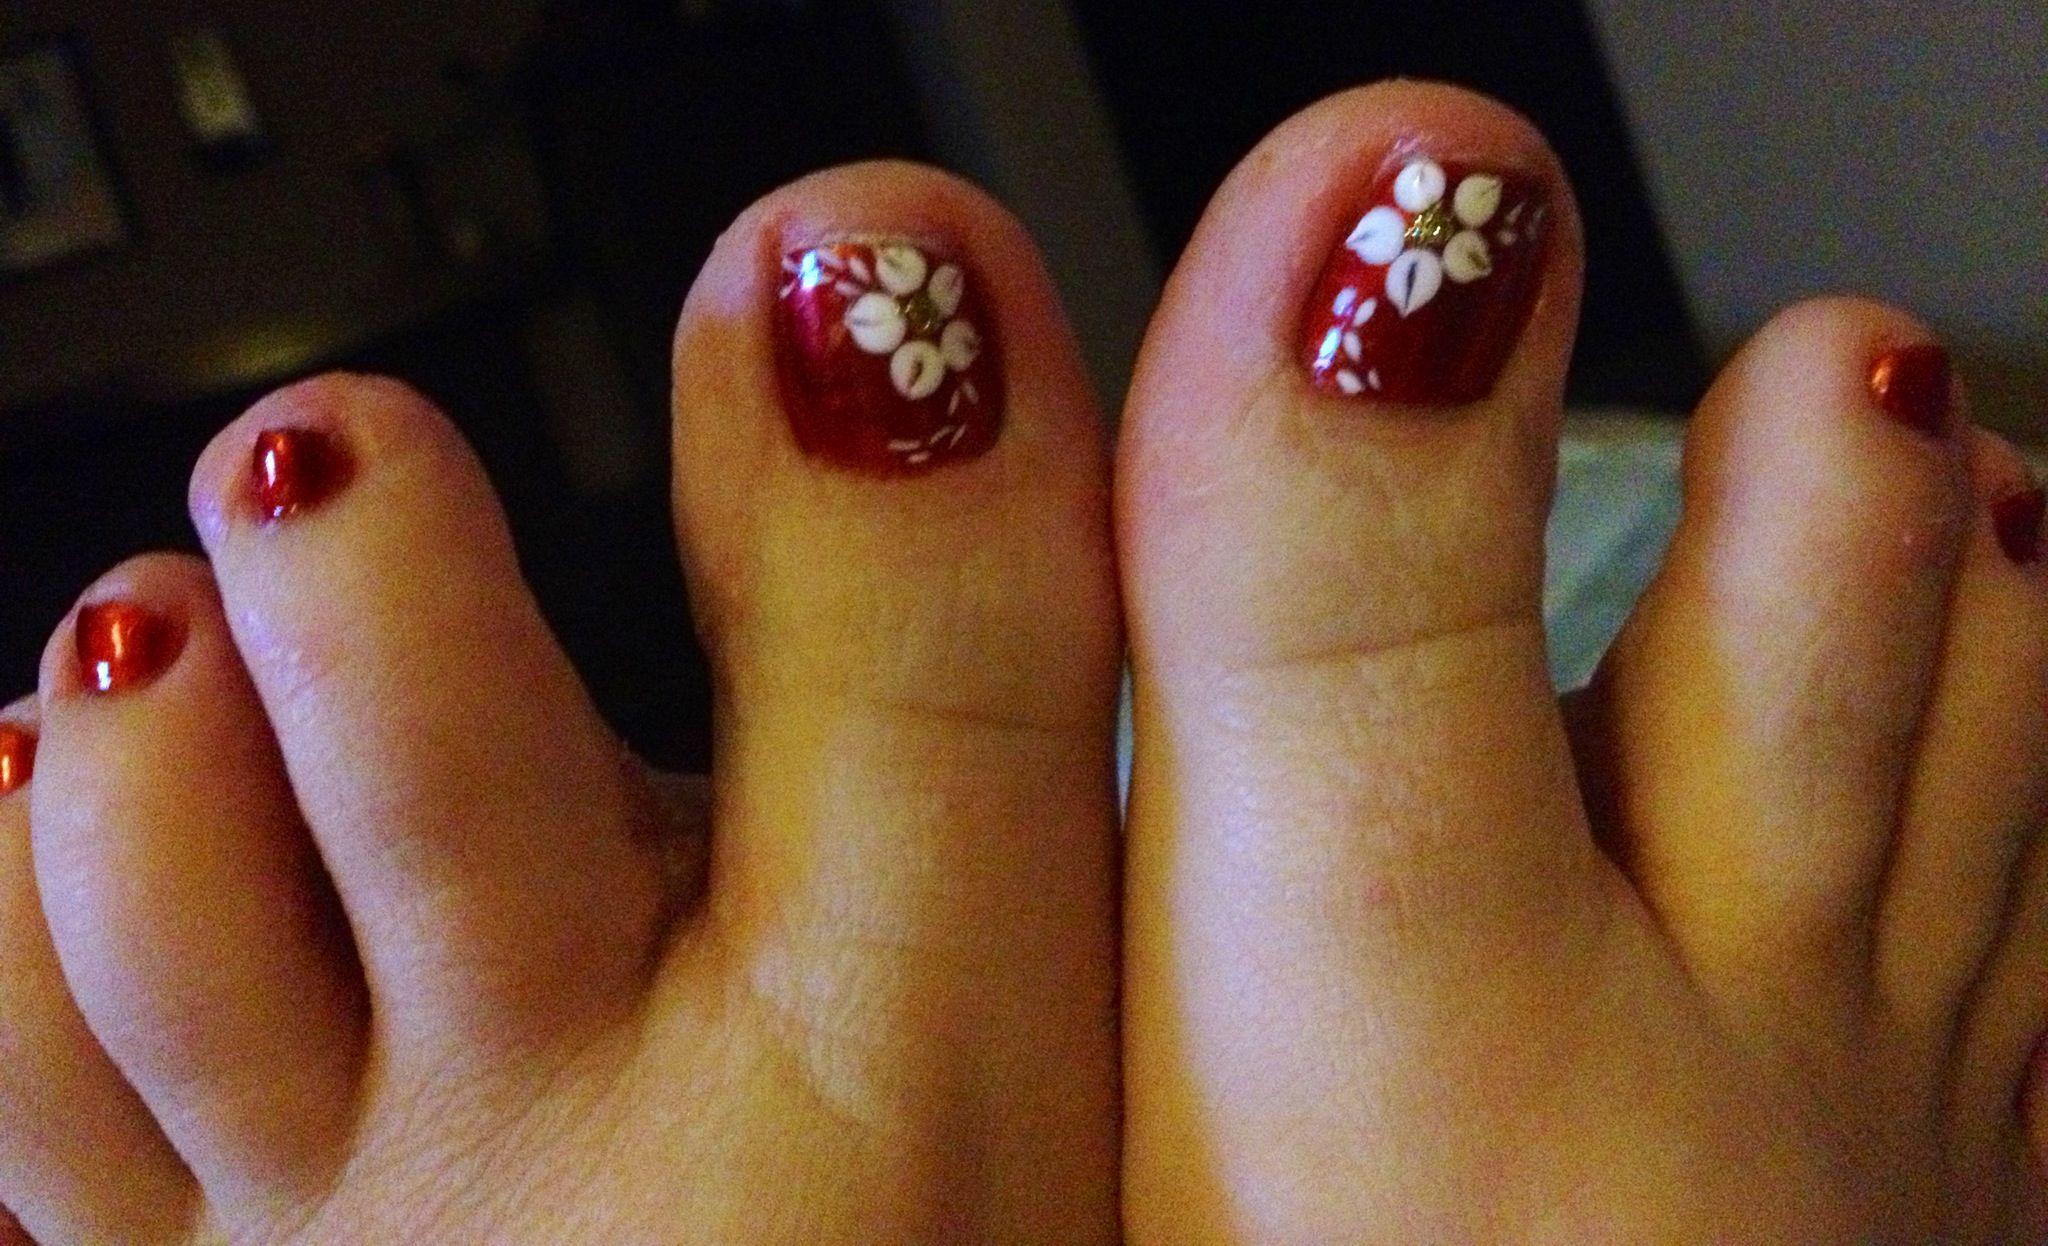 Cute toe nail design for Fall/Autumn | Beauty | Pinterest | Toe nail ...